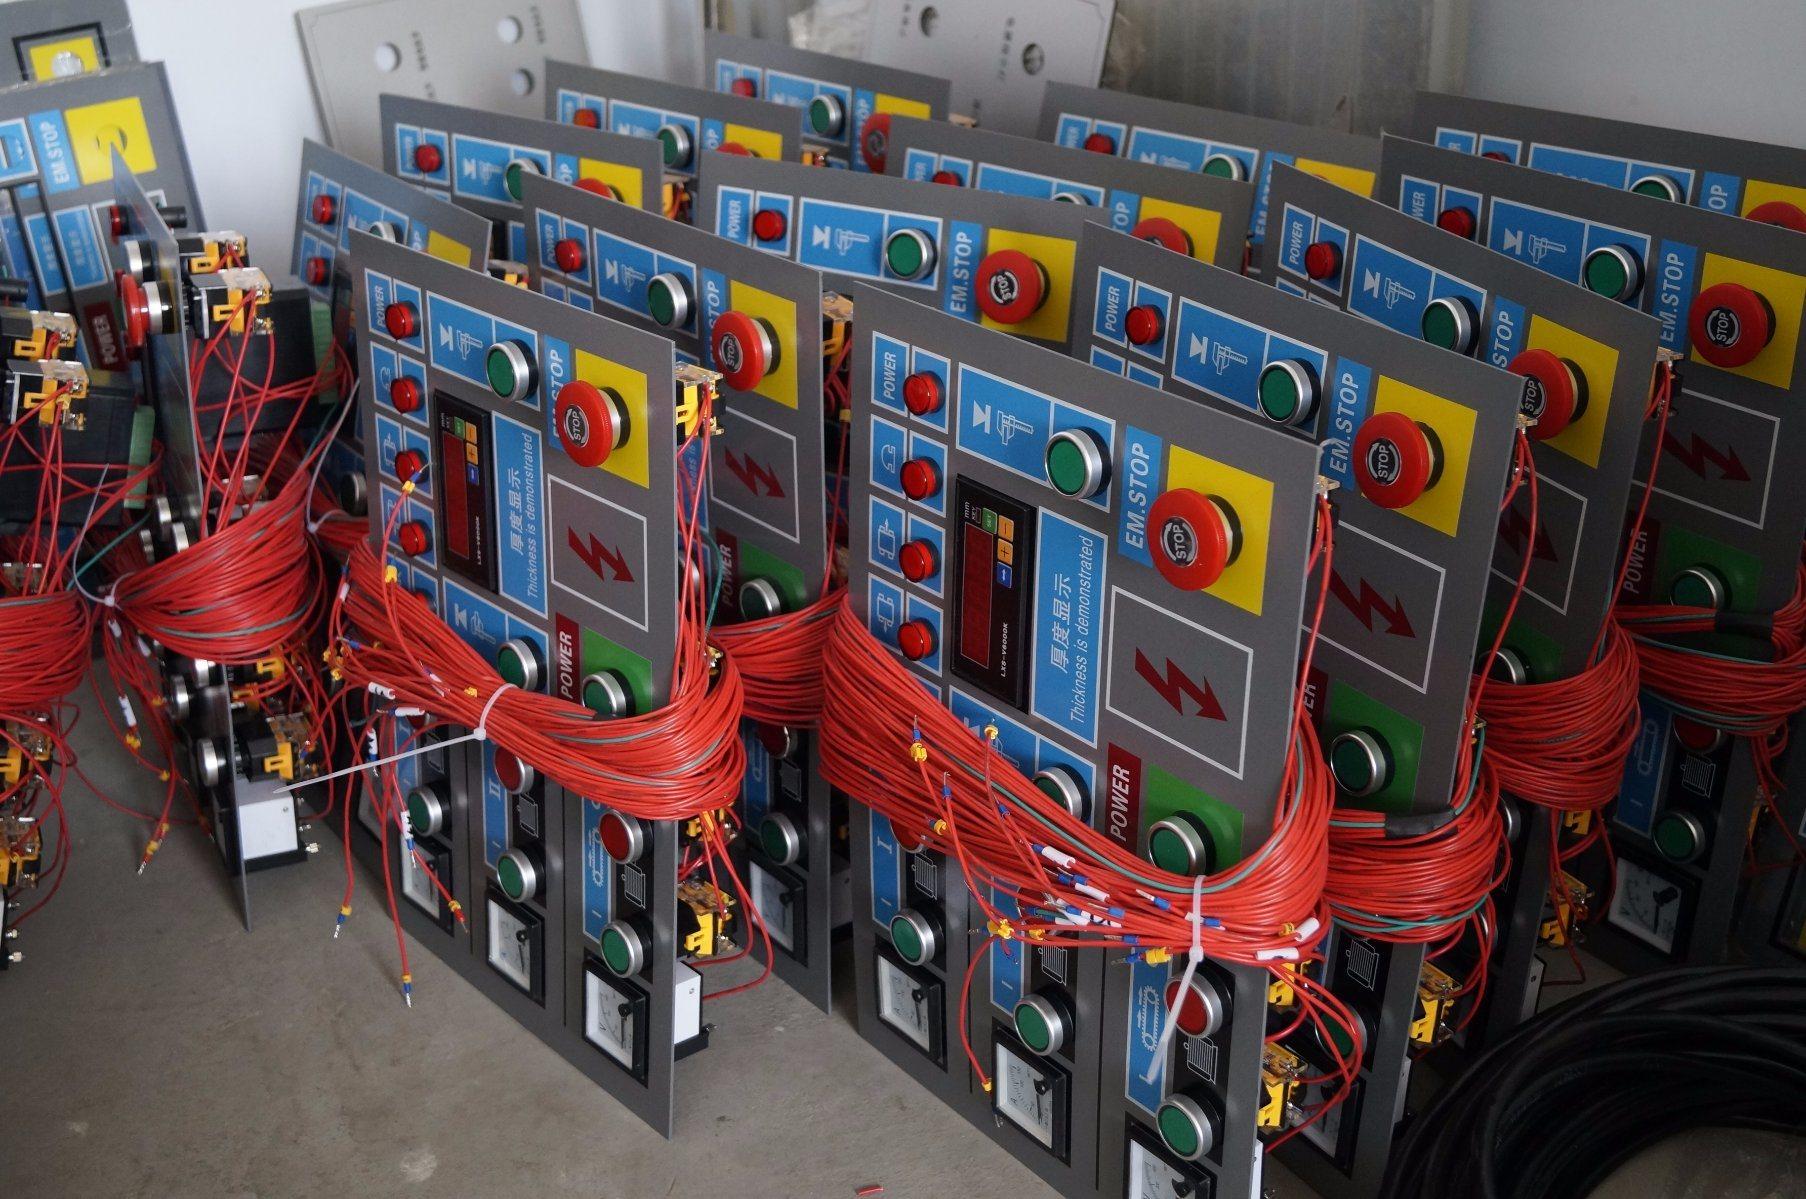 China electrical control precise panel saw cnc table saw photos electrical control precise panel saw cnc table saw greentooth Image collections